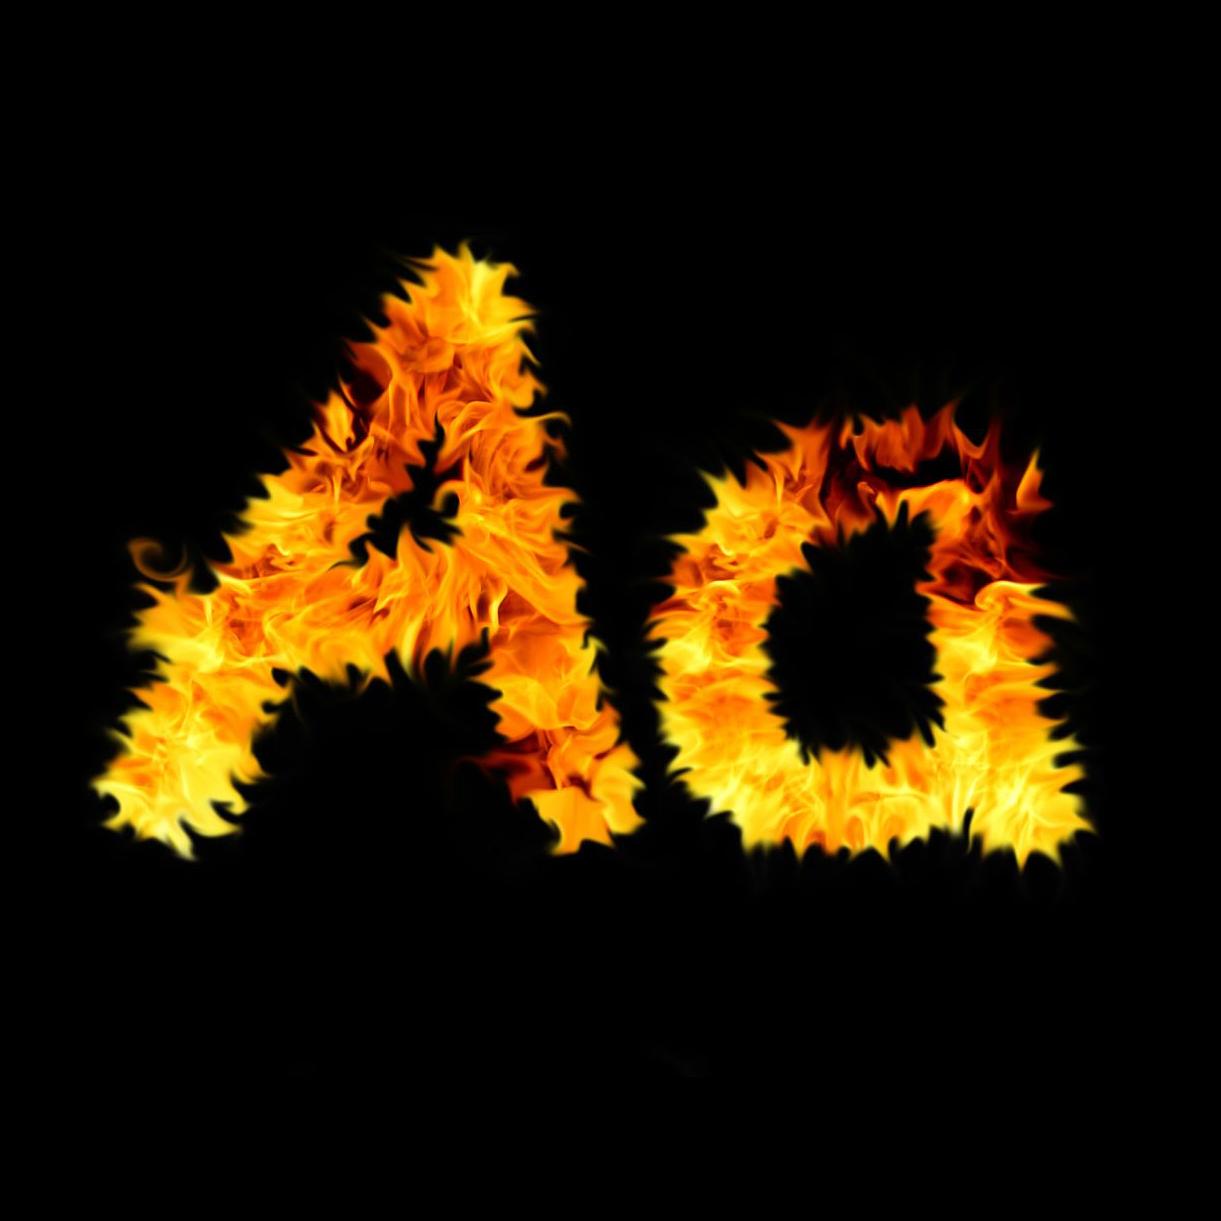 Fire letter, Magic, Glow, Heat, Hot, HQ Photo